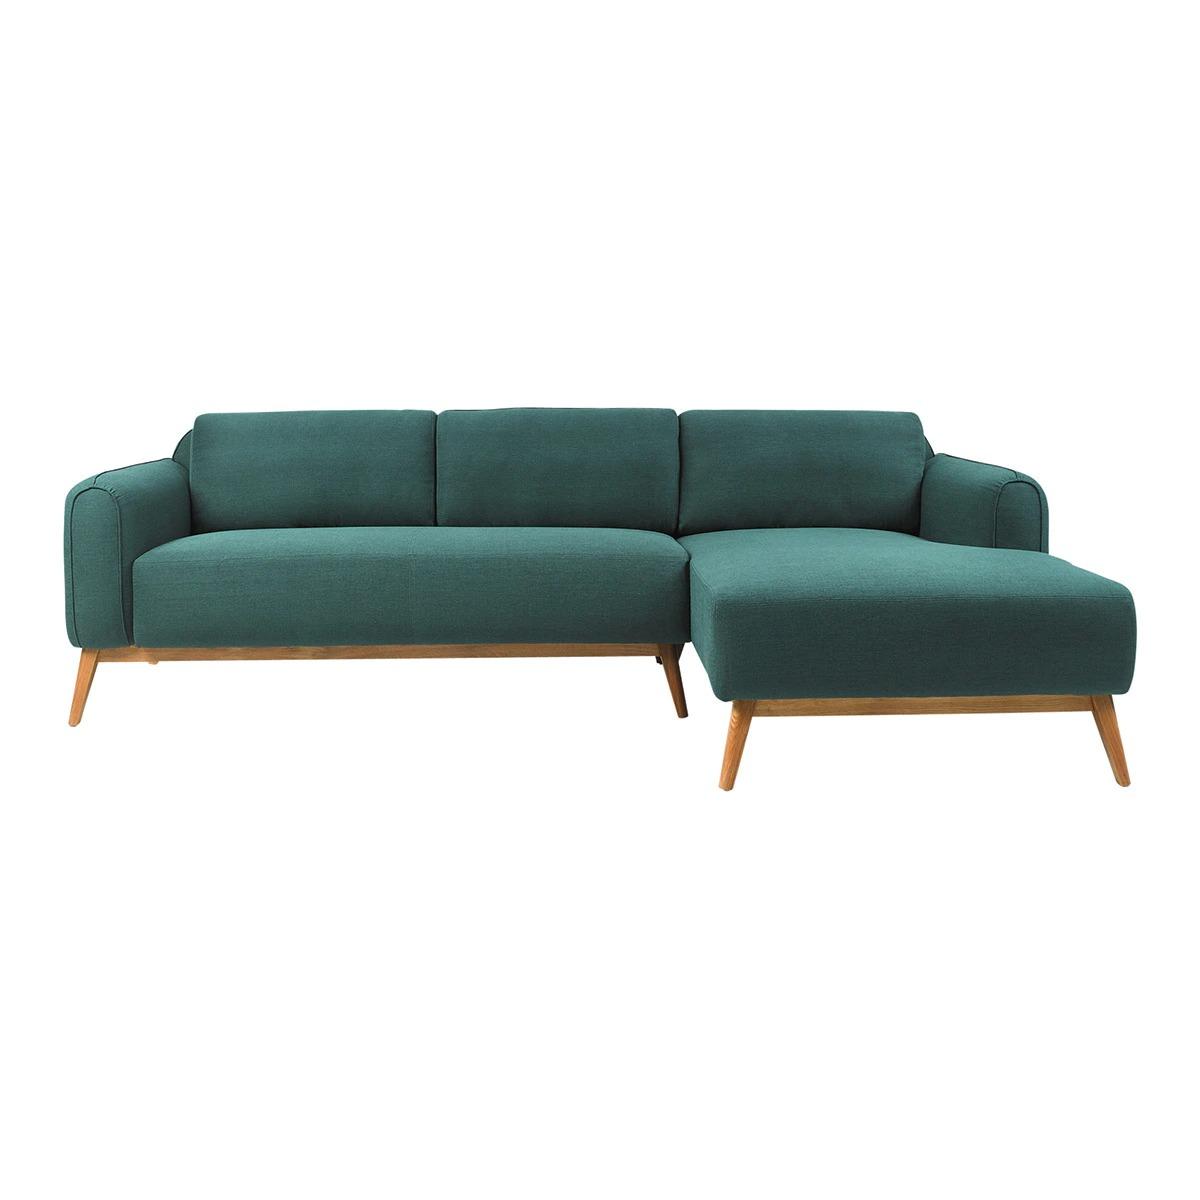 Sofá con chaise longue derecha Green Room